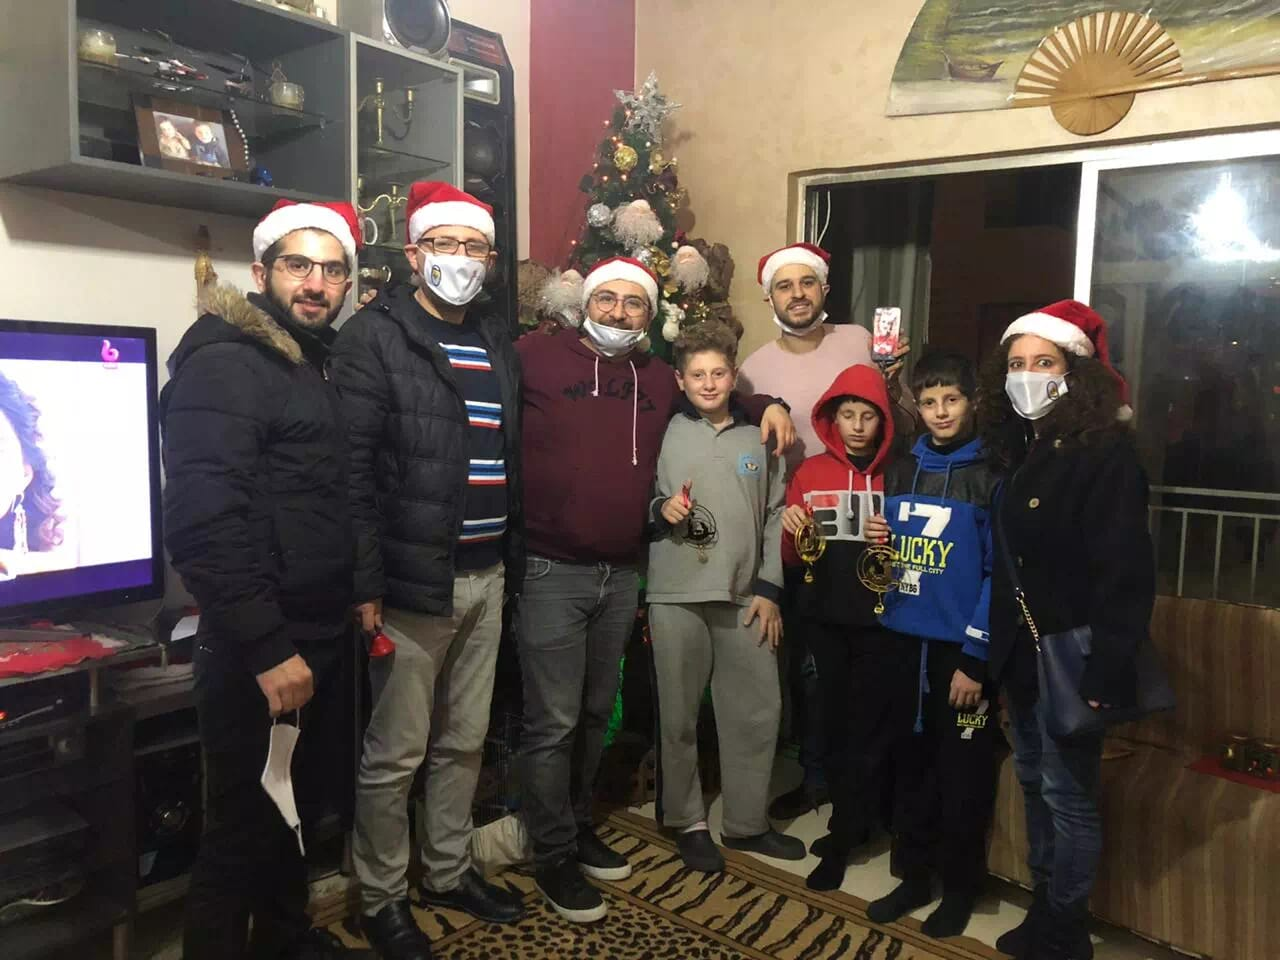 https://eundemia.sirv.com/Images/christmas/456904.webp